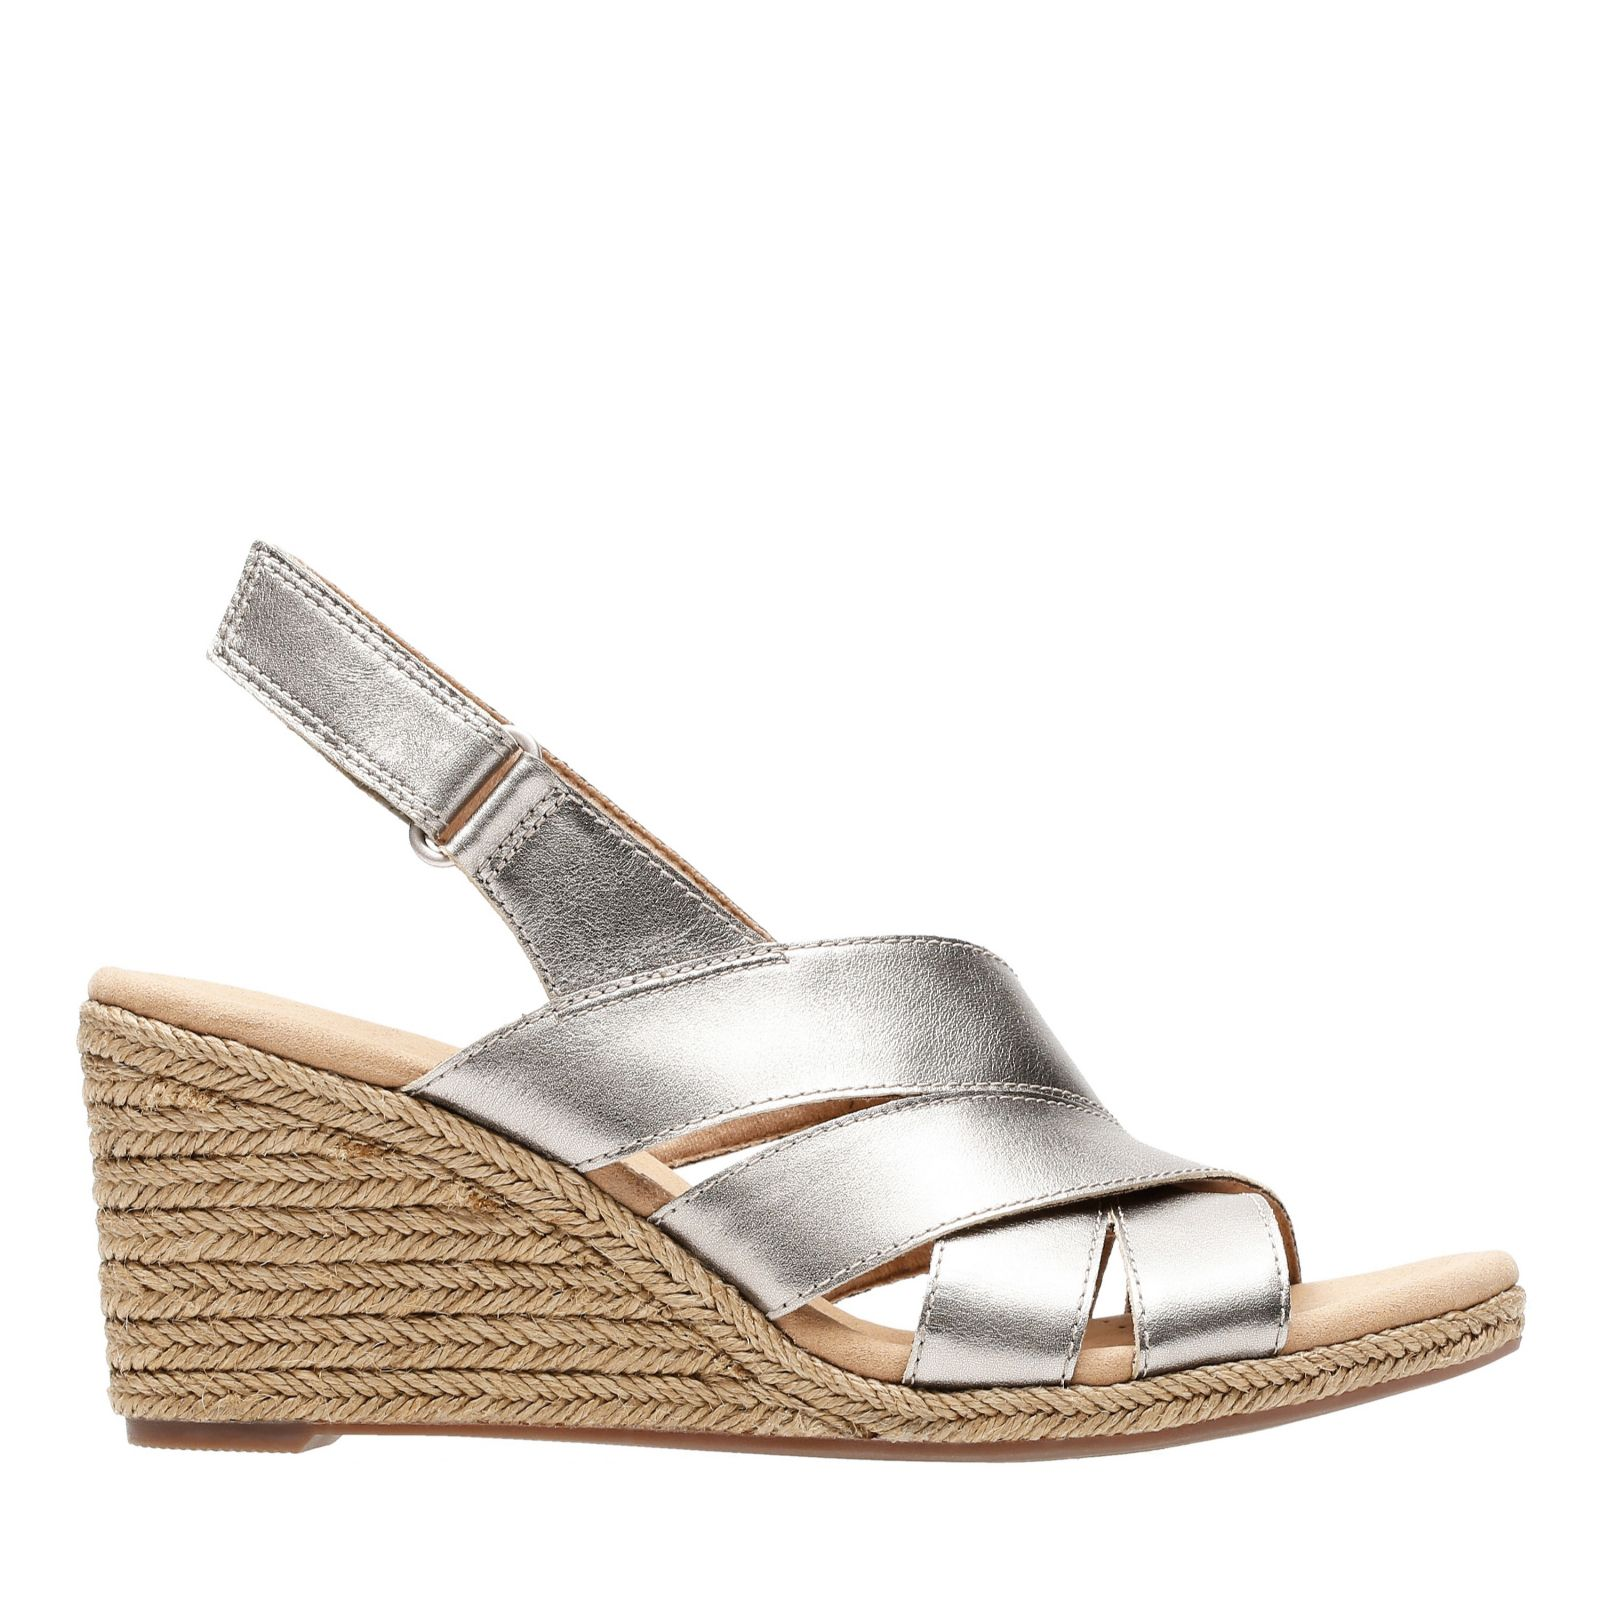 Clarks Lafely Krissy Wedge Sandal Standard Fit - QVC UK